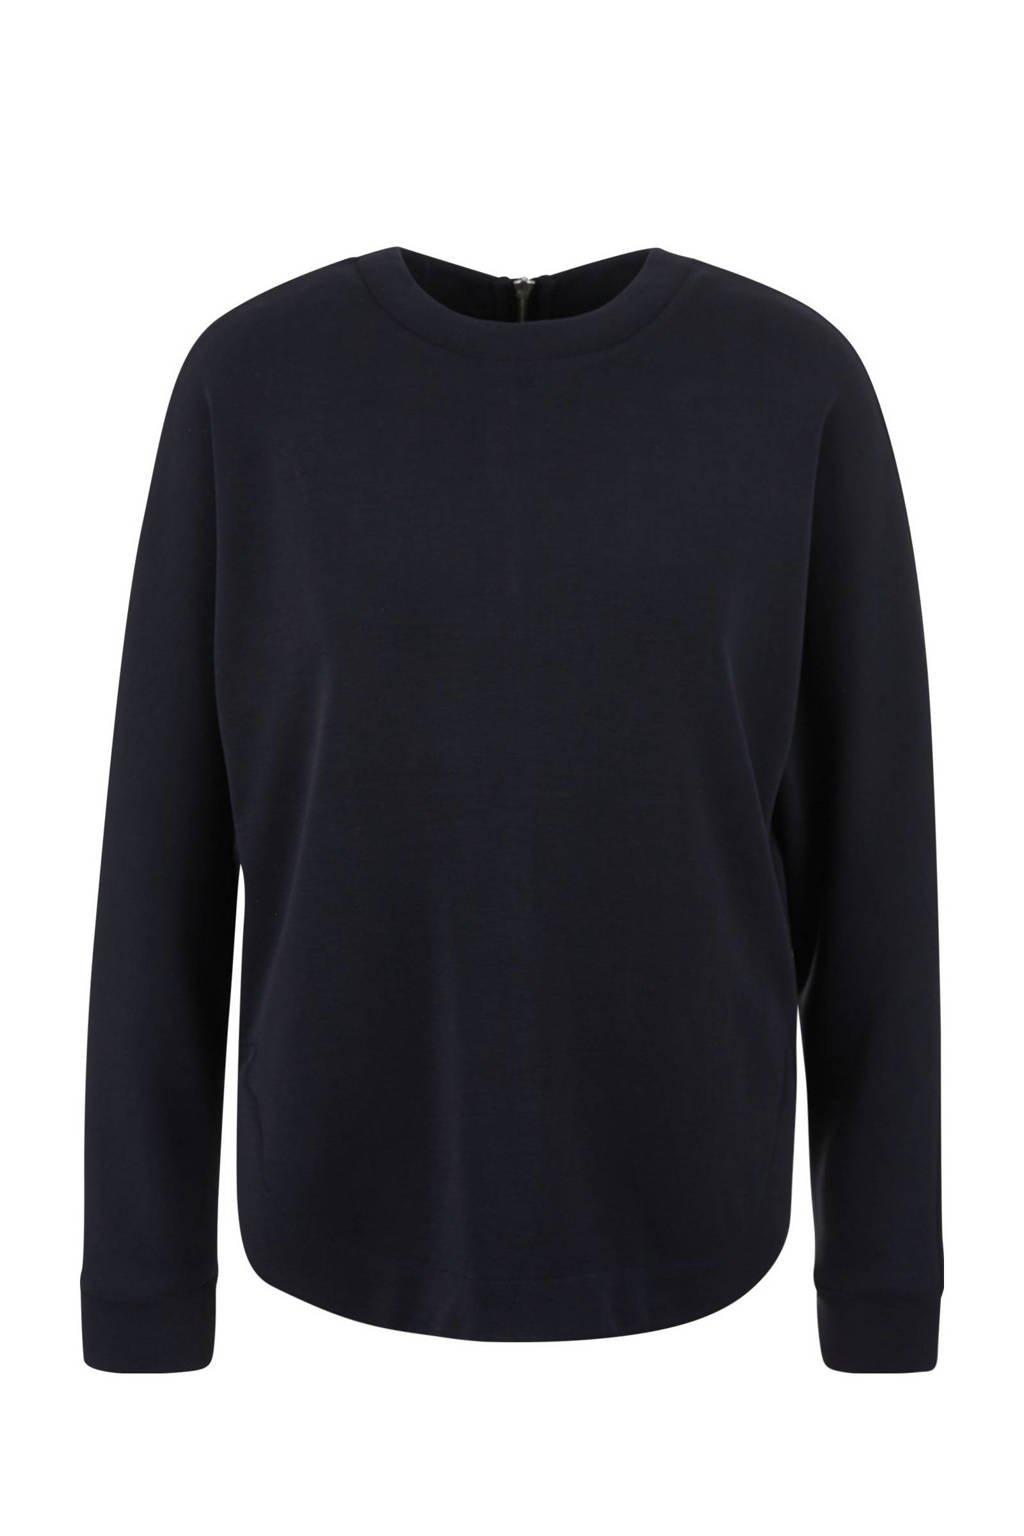 s.Oliver gebreide sweater met textuur marine, Marine